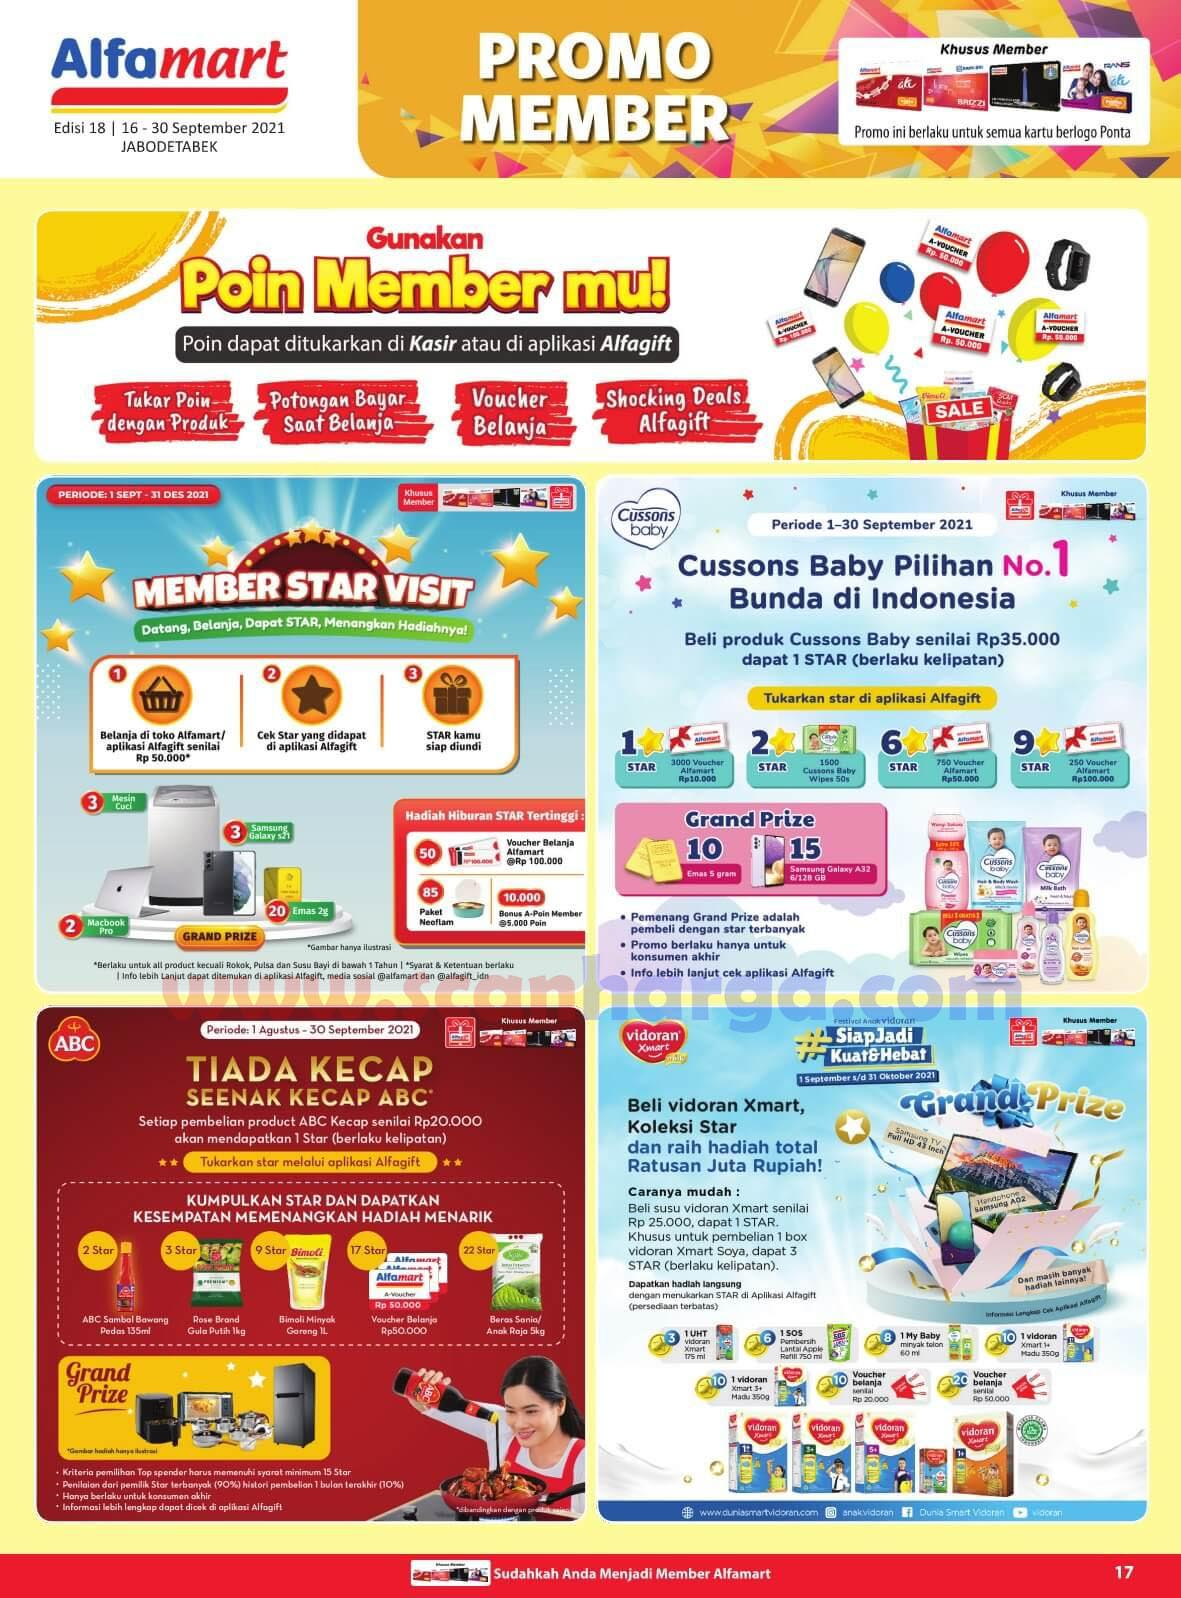 Katalog Promo Alfamart 16 - 30 September 2021 17